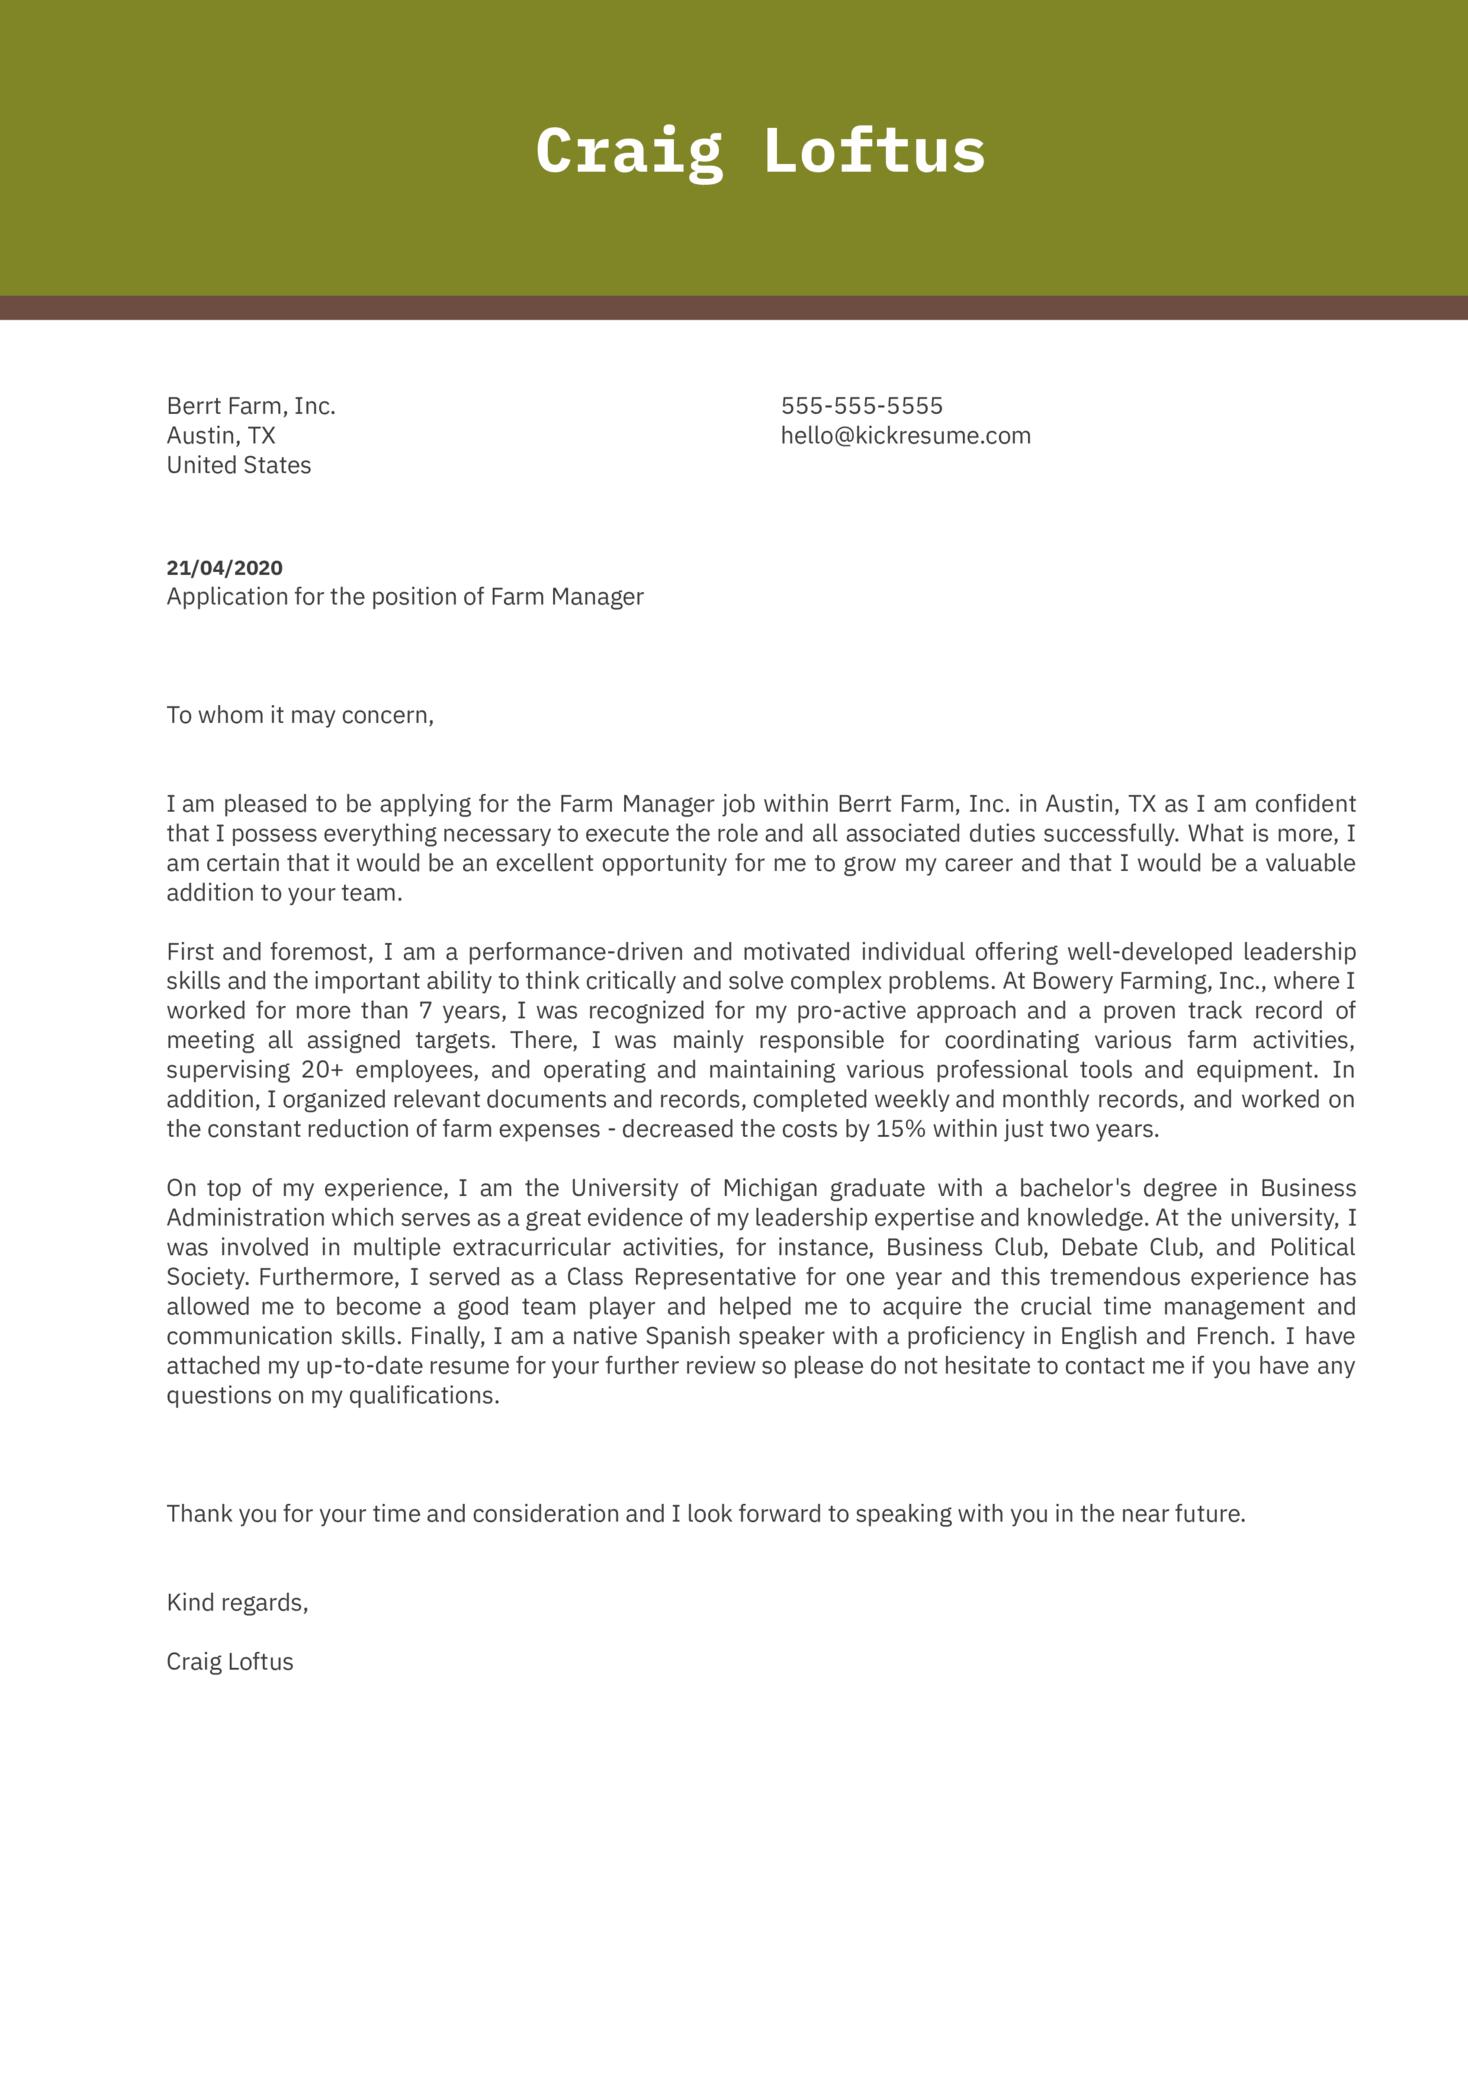 Farm Manager Cover Letter Sample